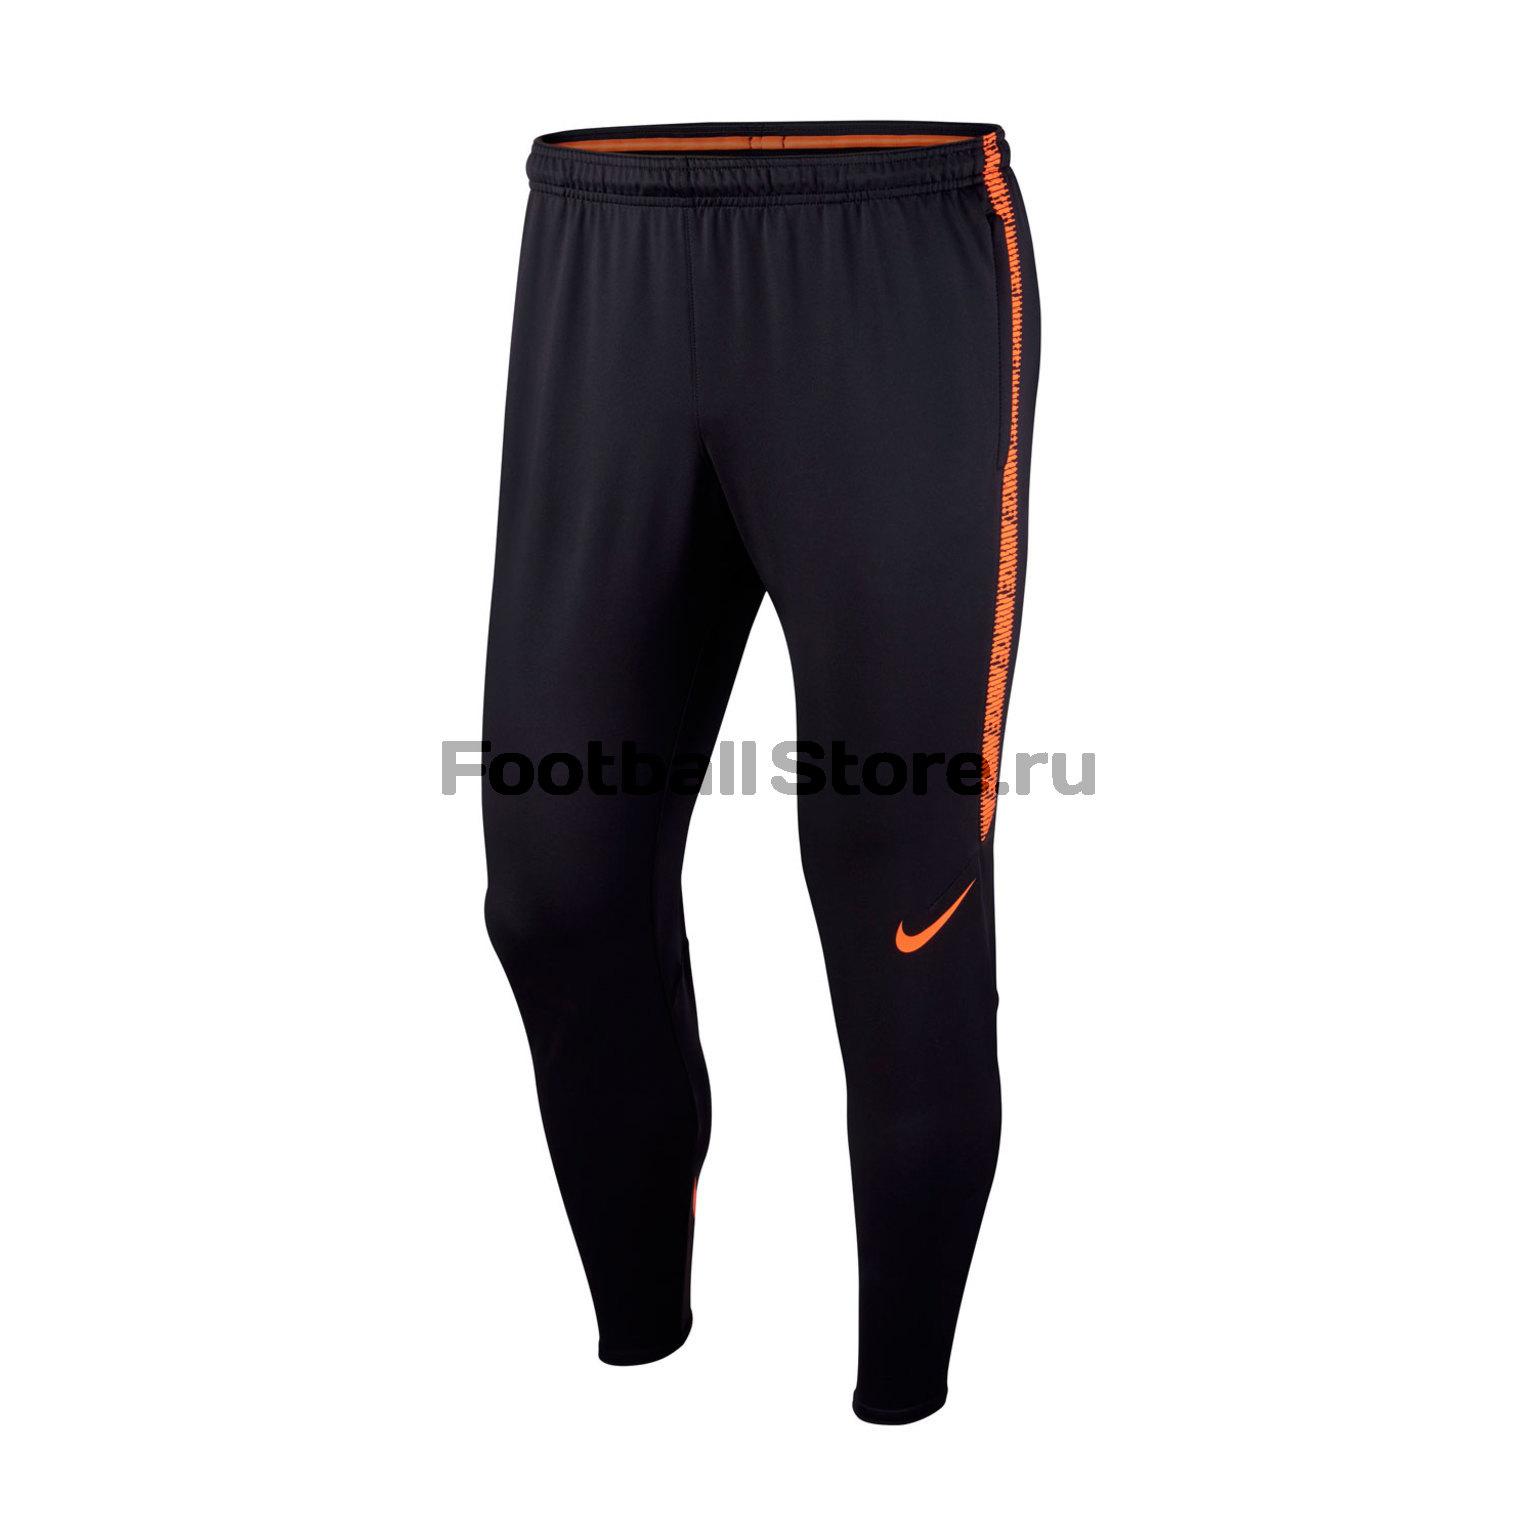 Брюки тренировочные Nike NK Dry Pant KP 859225-019 брюки тренировочные nike zenit m pant sqd kp pr размер m